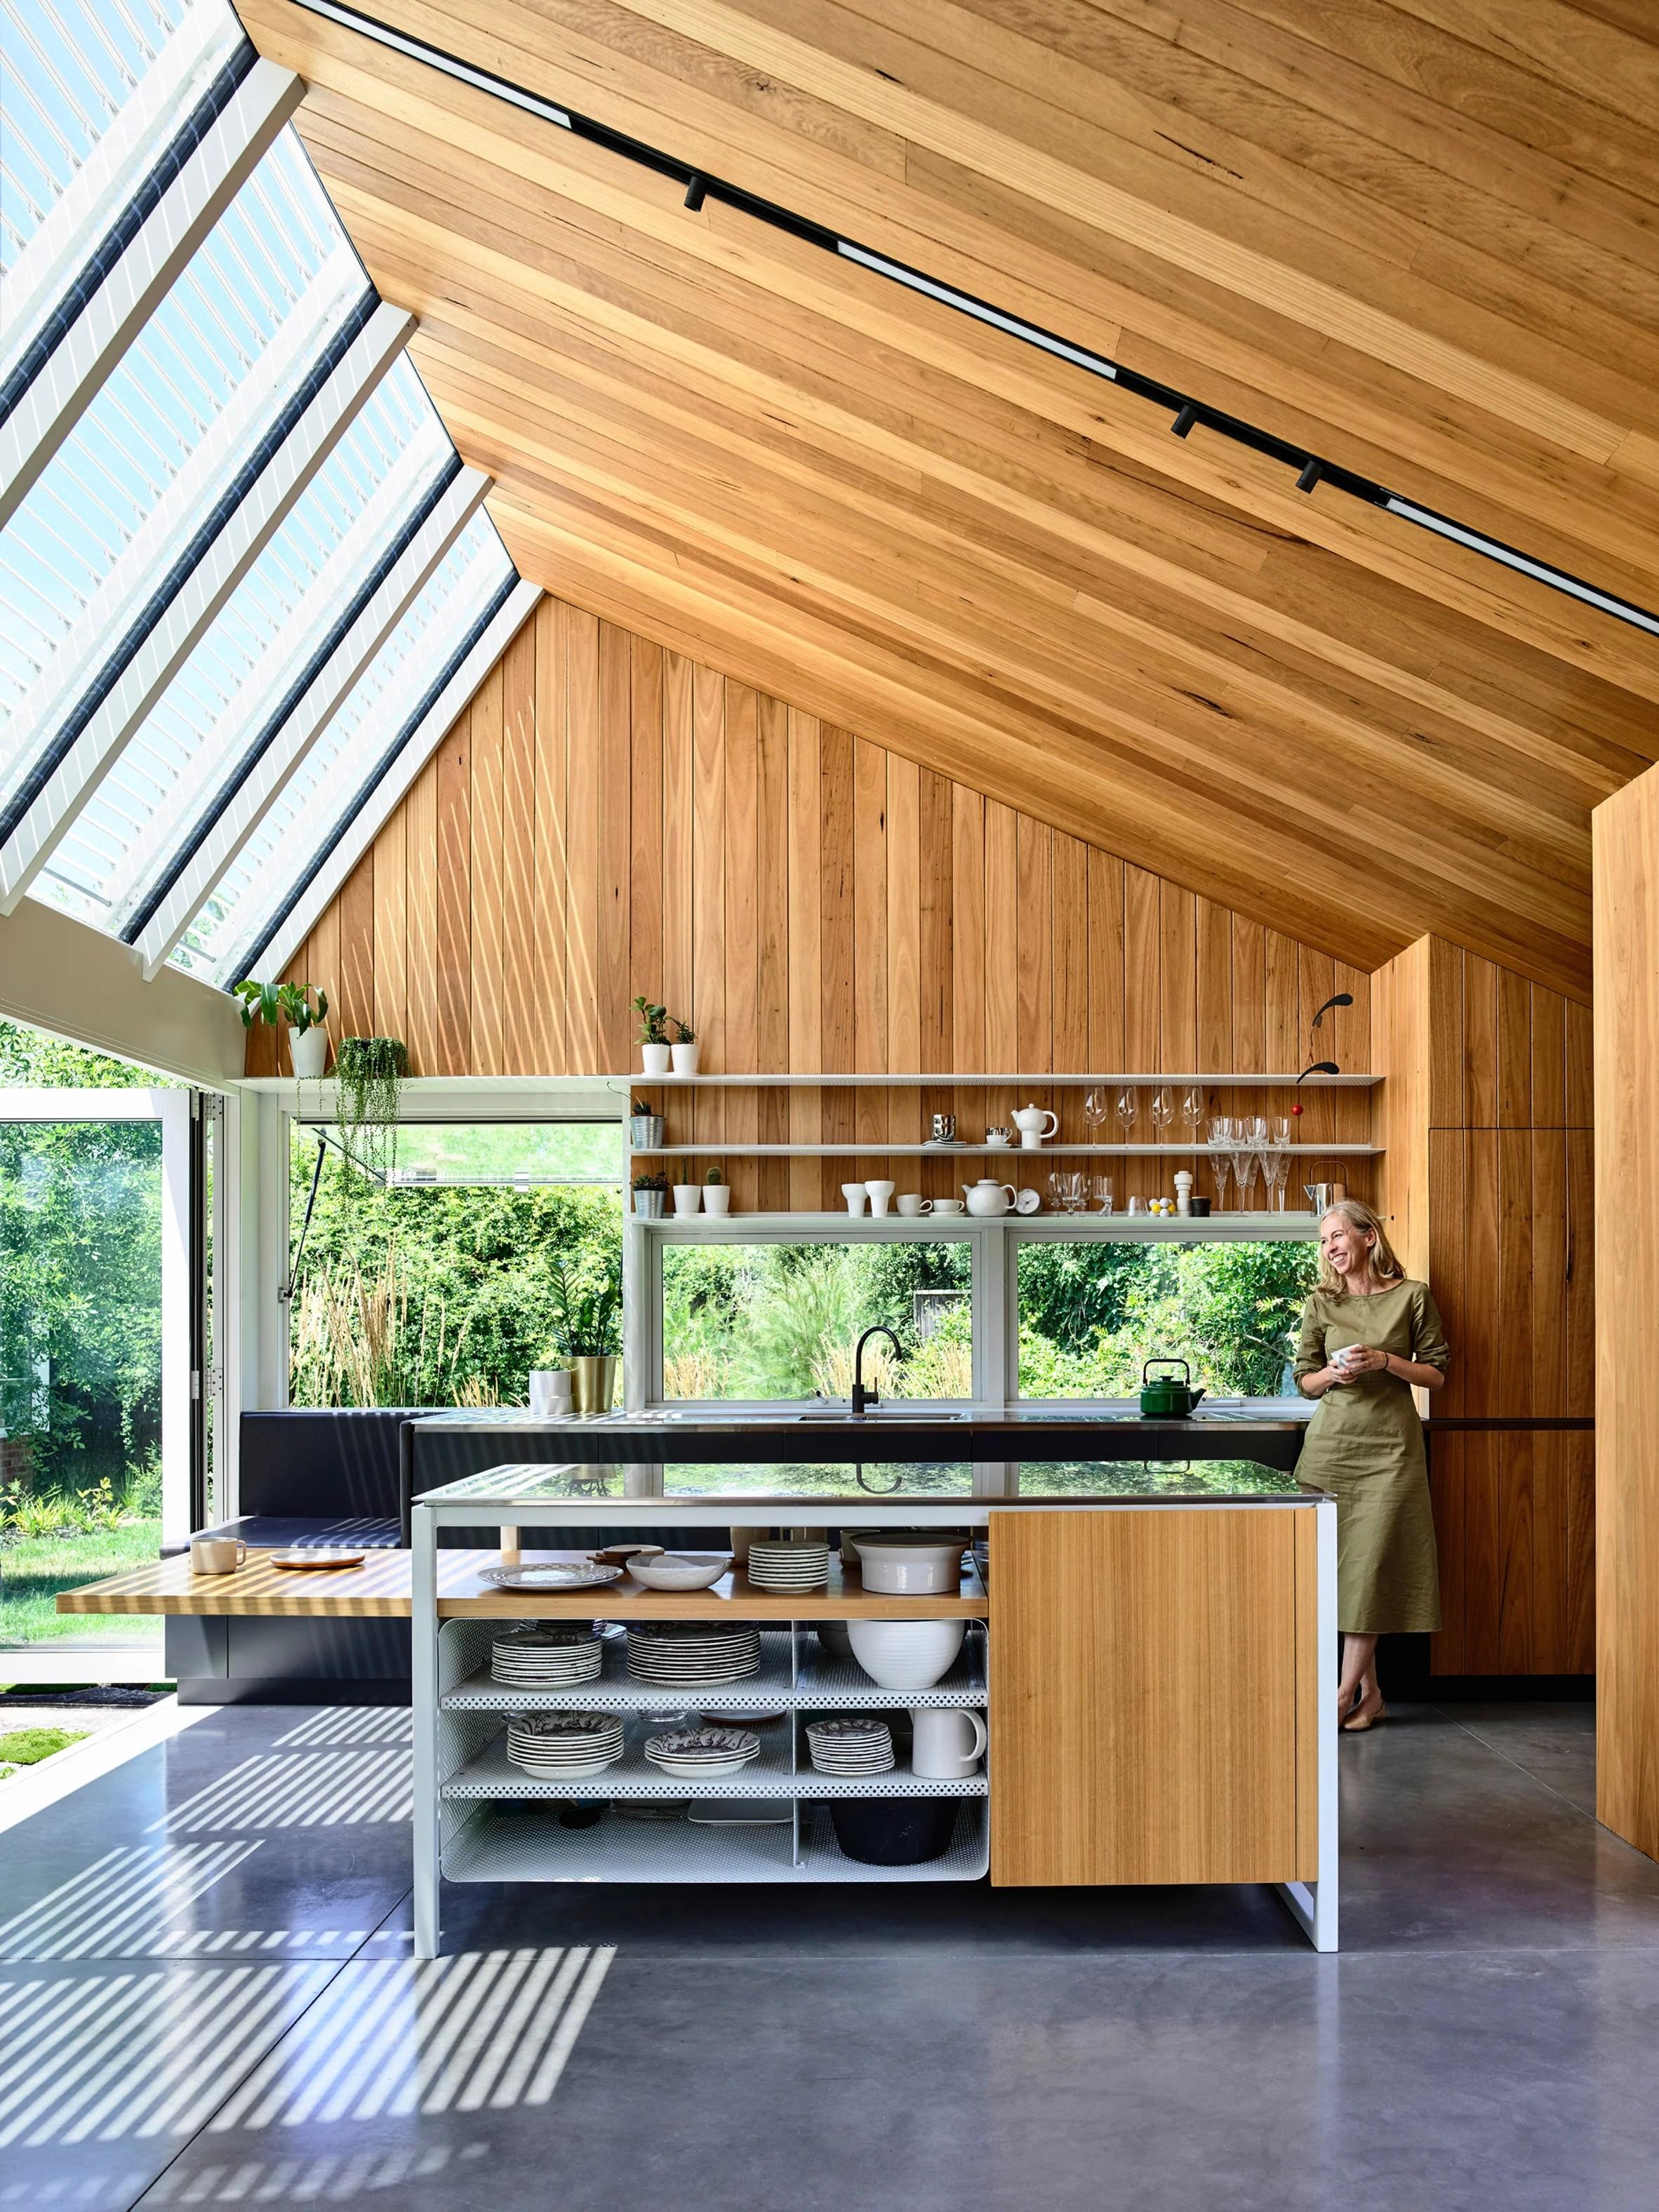 Empire House by Austin Maynard Architects kitchen